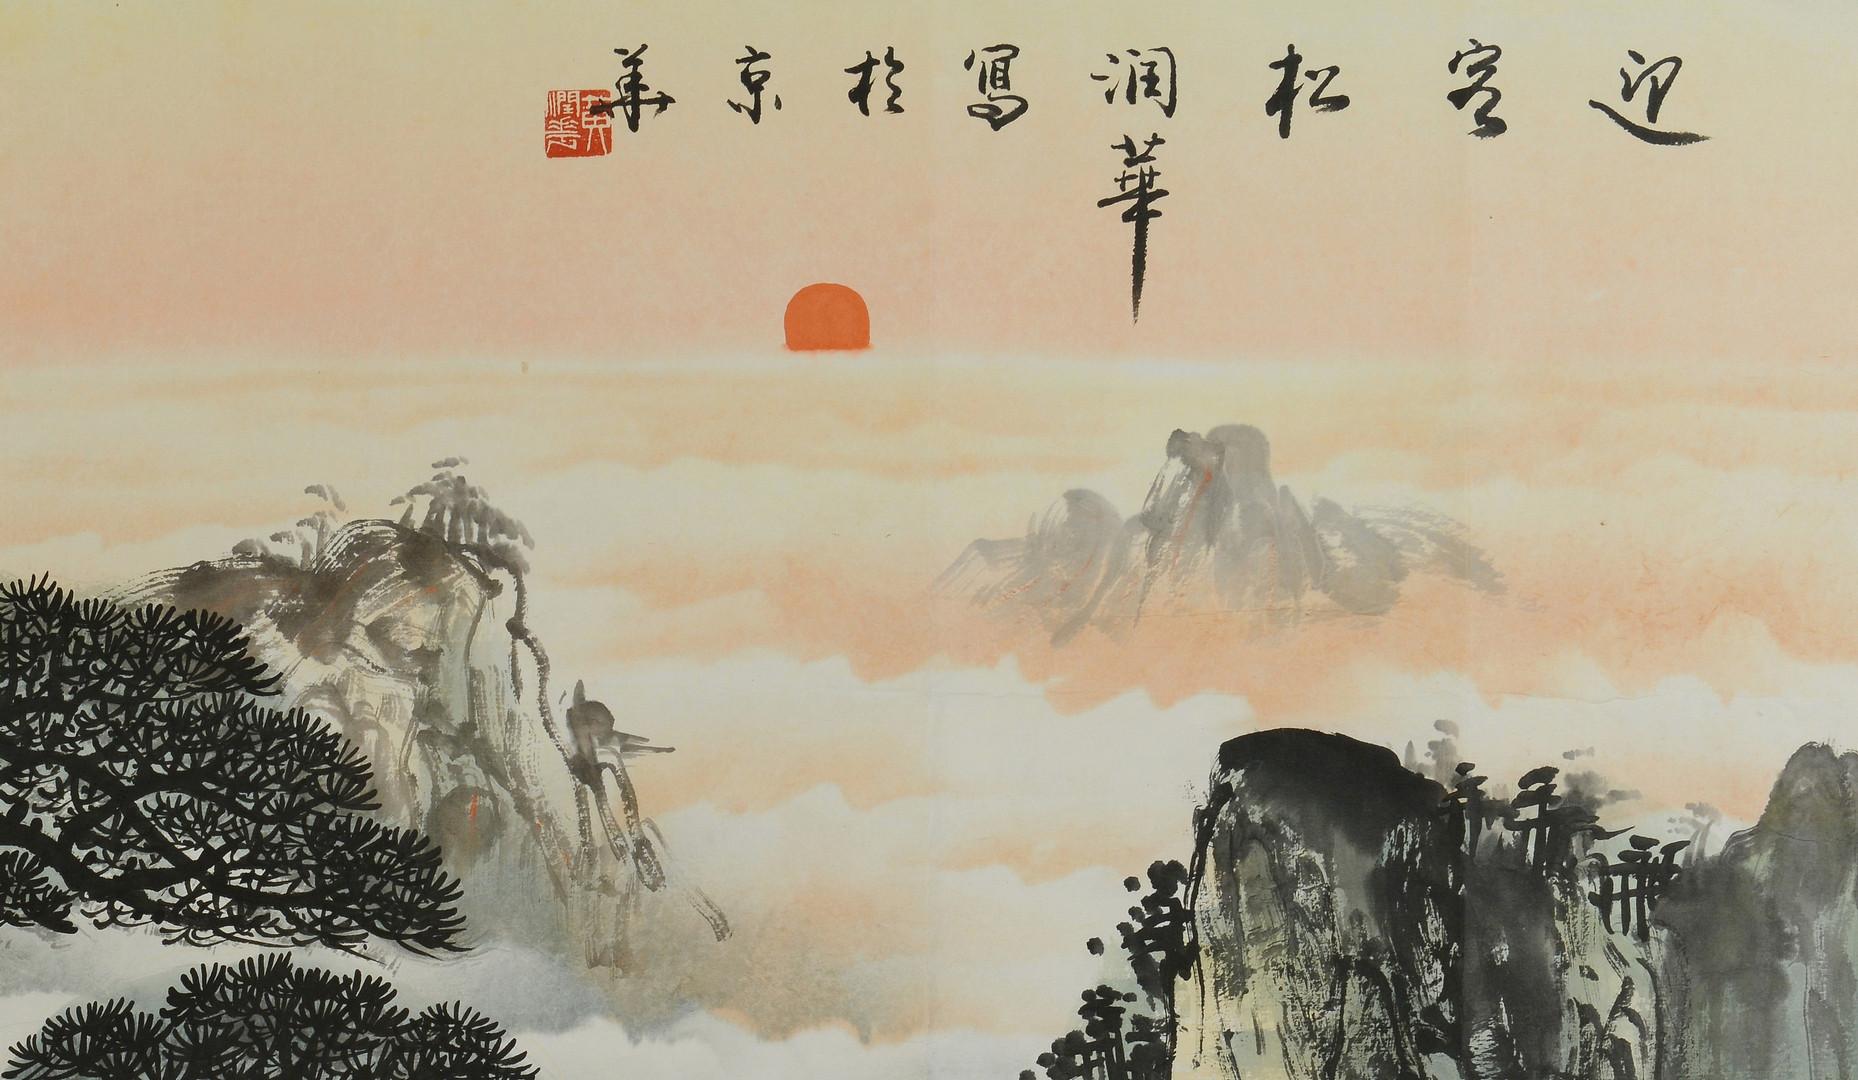 Lot 485: Chinese Scroll Painting, Runhua Huang